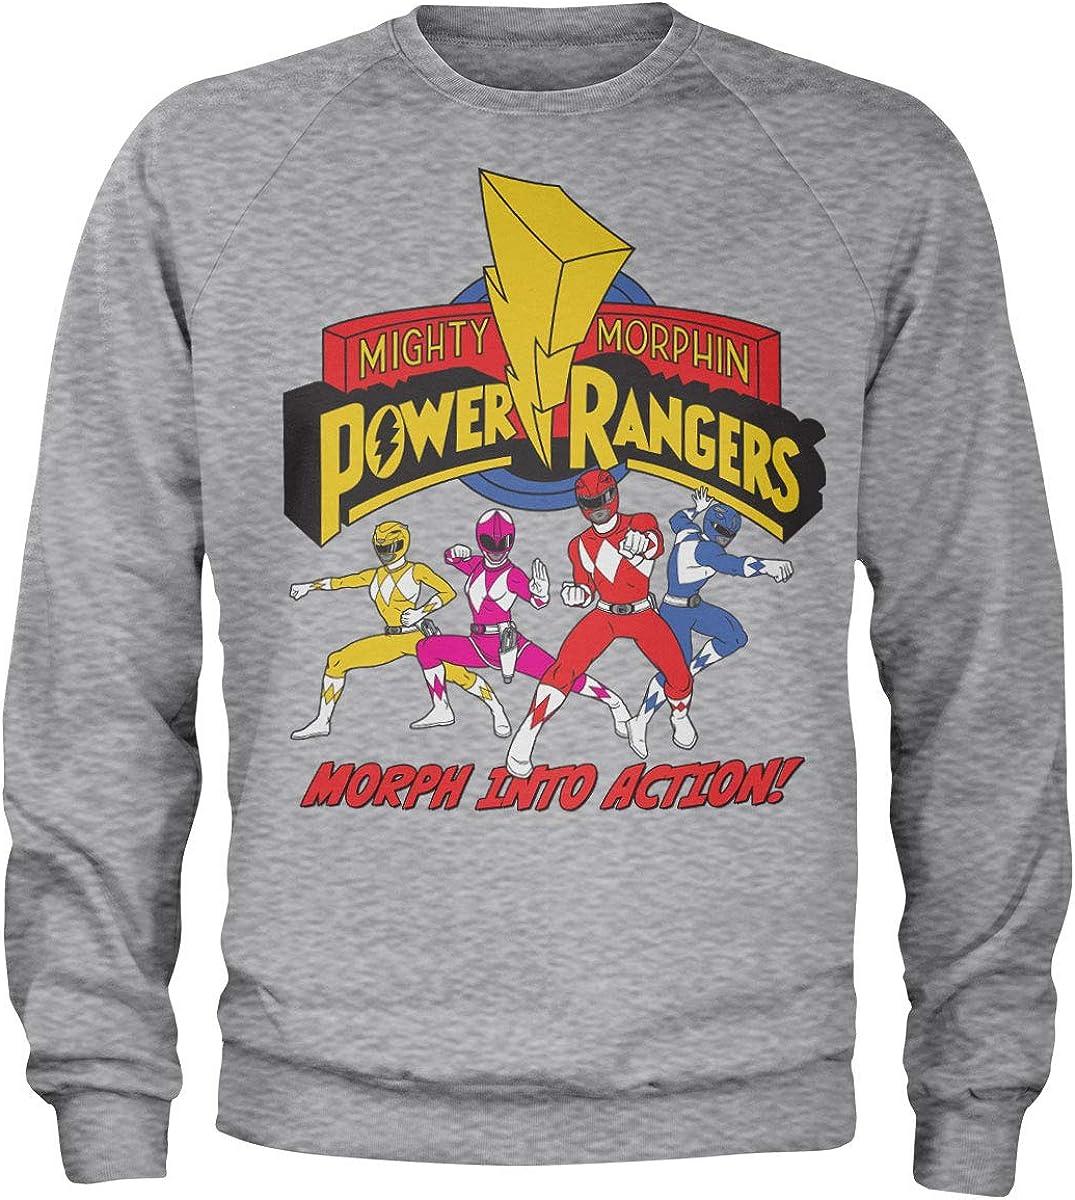 Power Rangers ストアー Officially 店内限界値引き中 セルフラッピング無料 Licensed Action Into Sweatshirt Morph